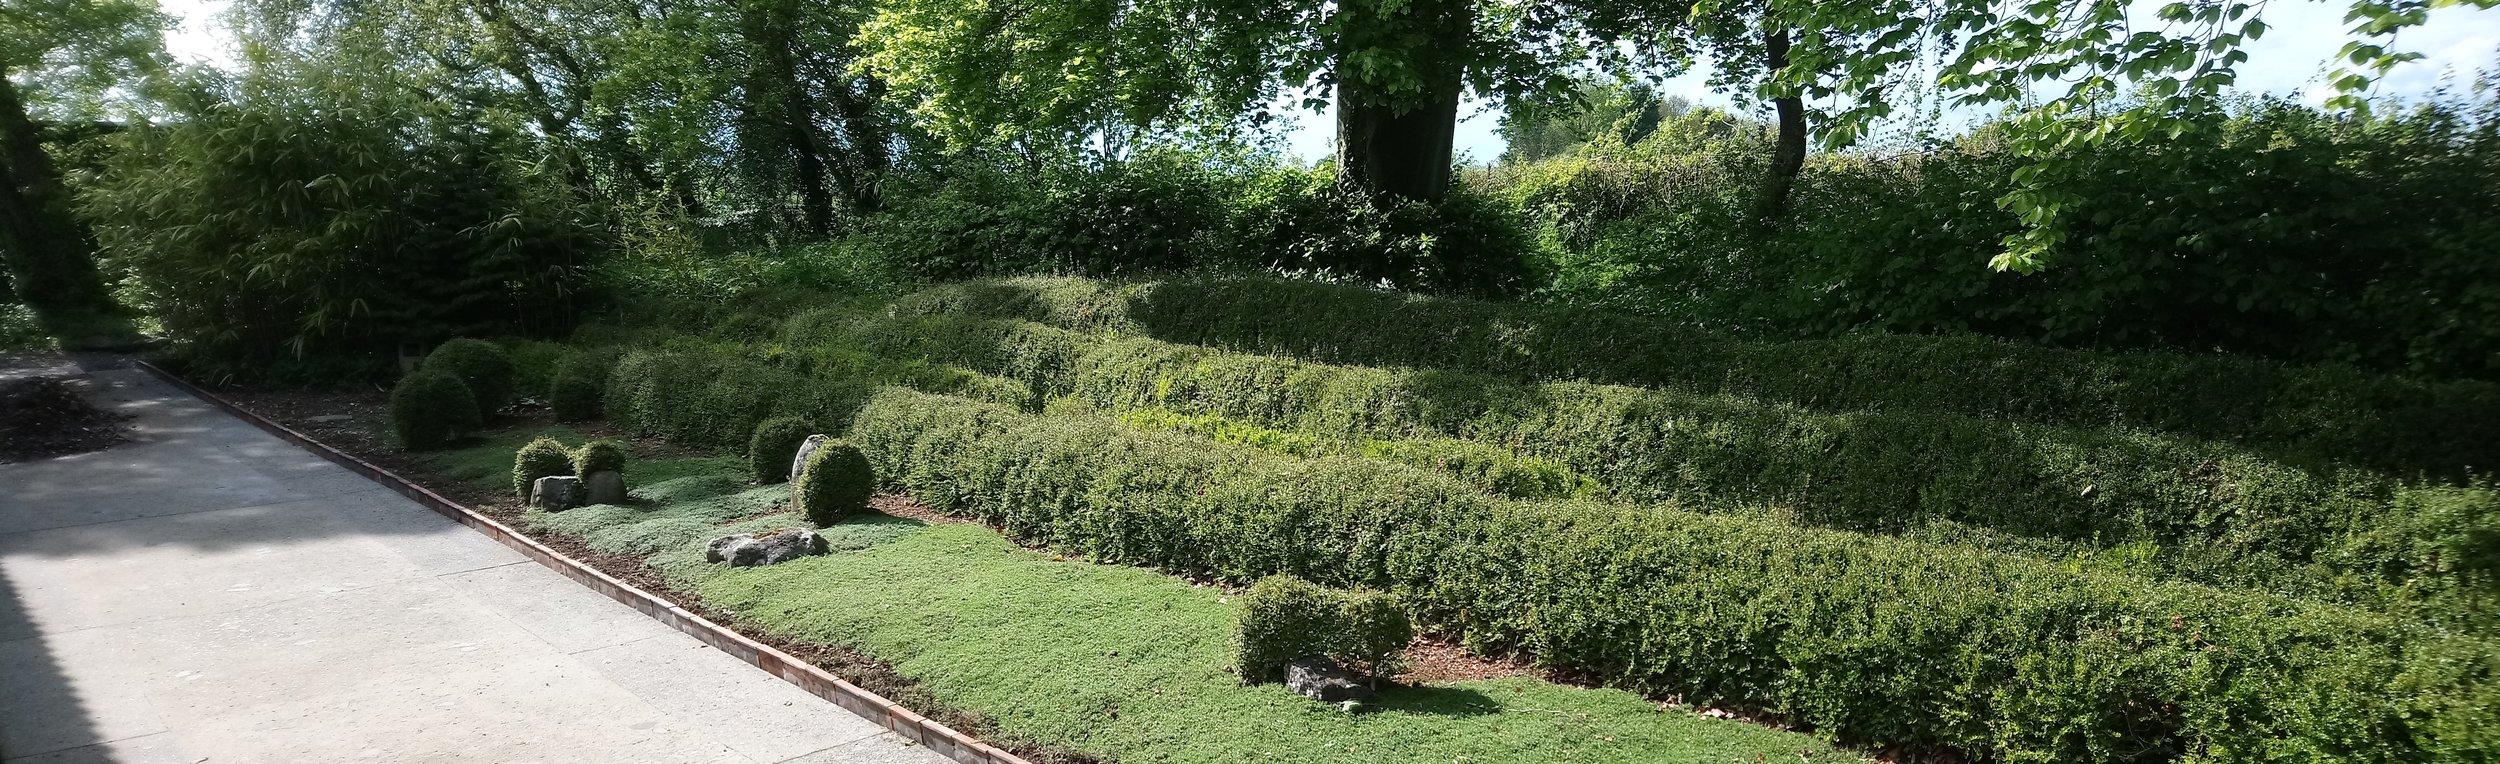 Rolling hills garden.jpg